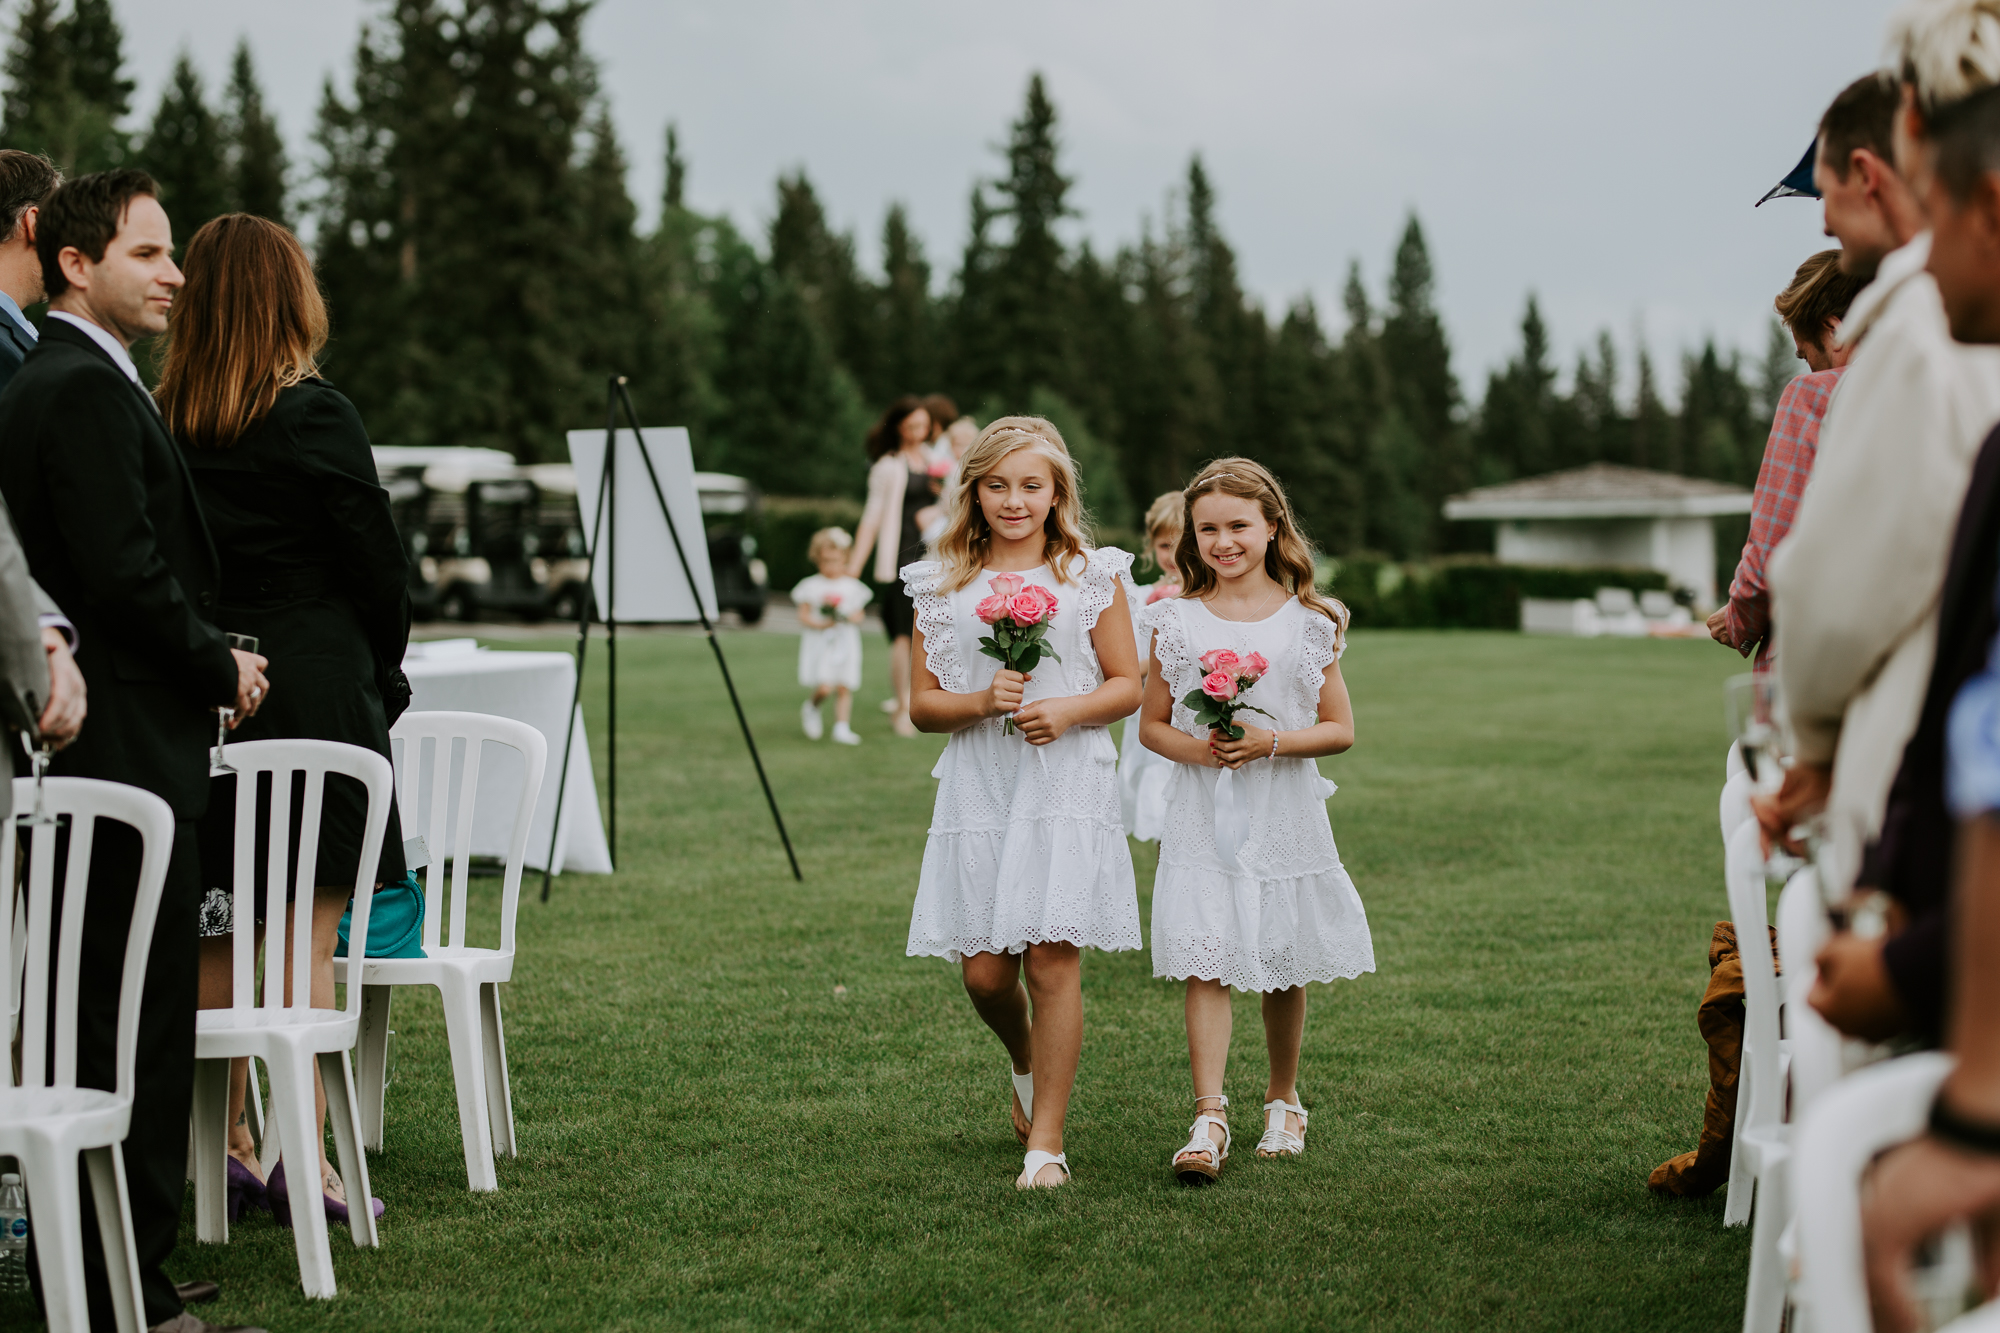 Priddis-Wedding-Photographer-JG-12.jpg